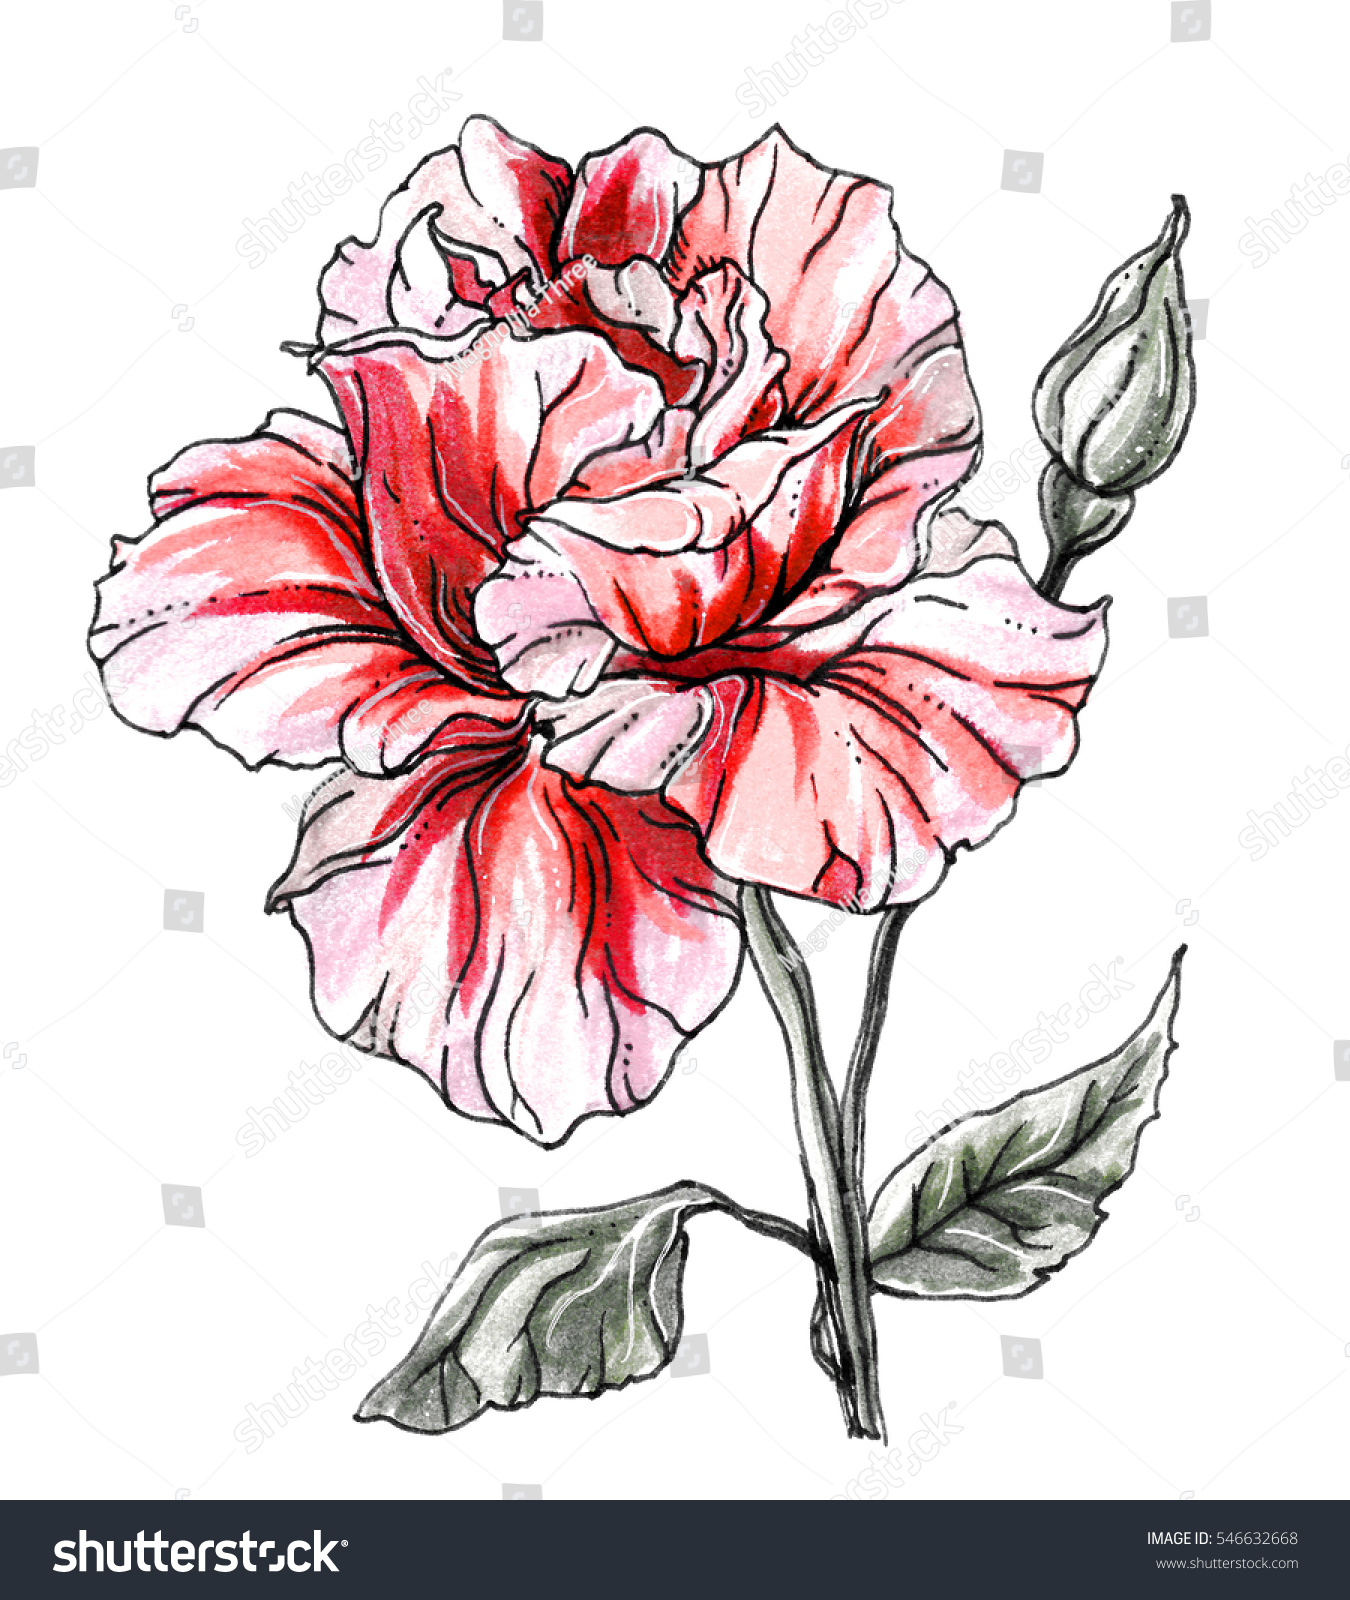 Dark Red Roses Flowers Watercolor Botanical Art Boho: Red Rose Blossom Hand Drawn Decorative Stock Illustration